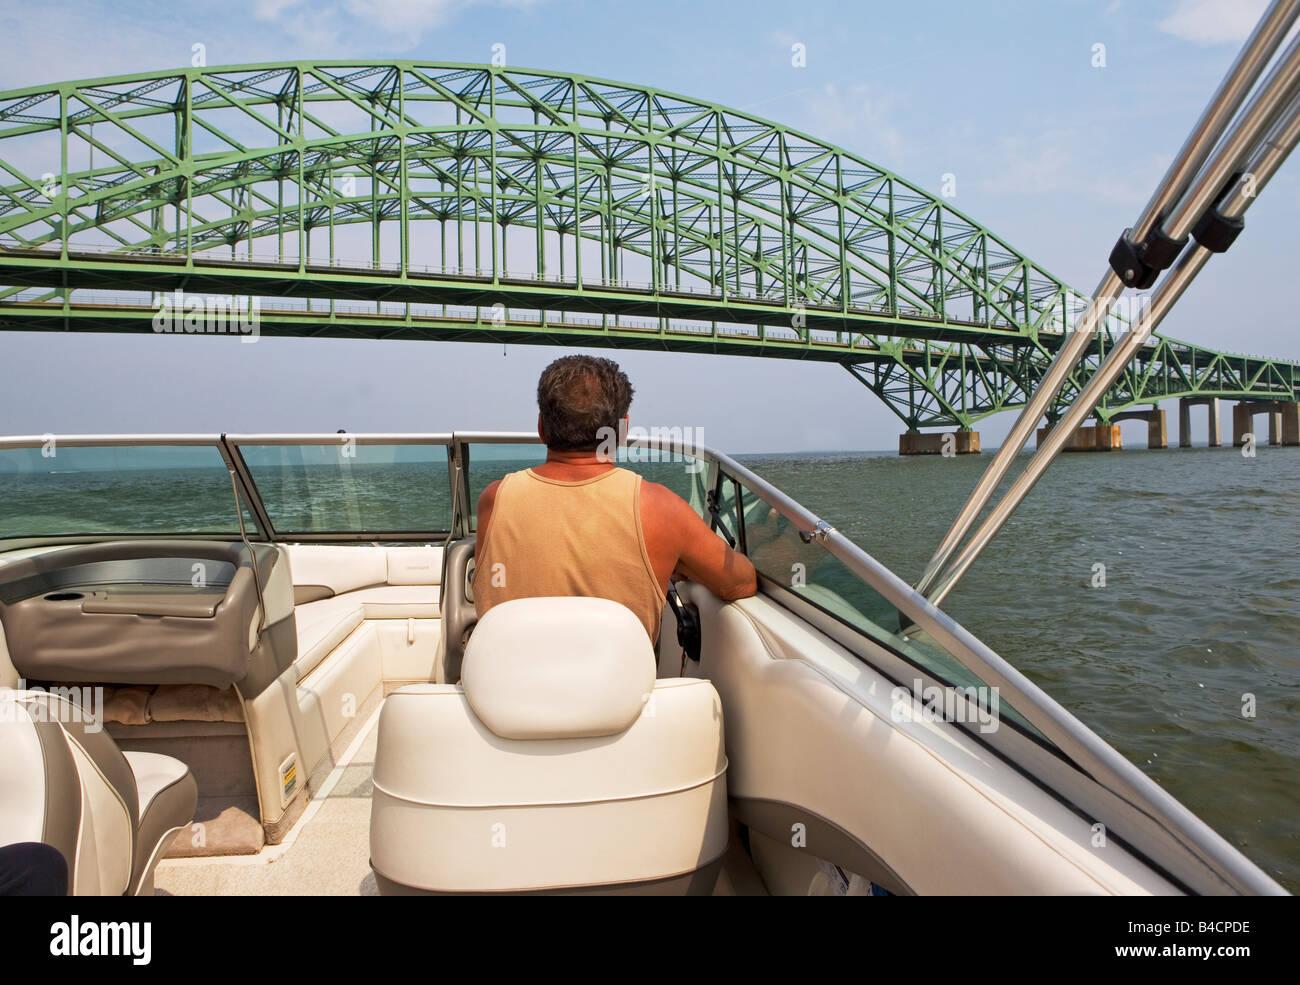 power, boat, motor, water, sport, cruising, recreation, fast, floating, driver, man, steering - Stock Image